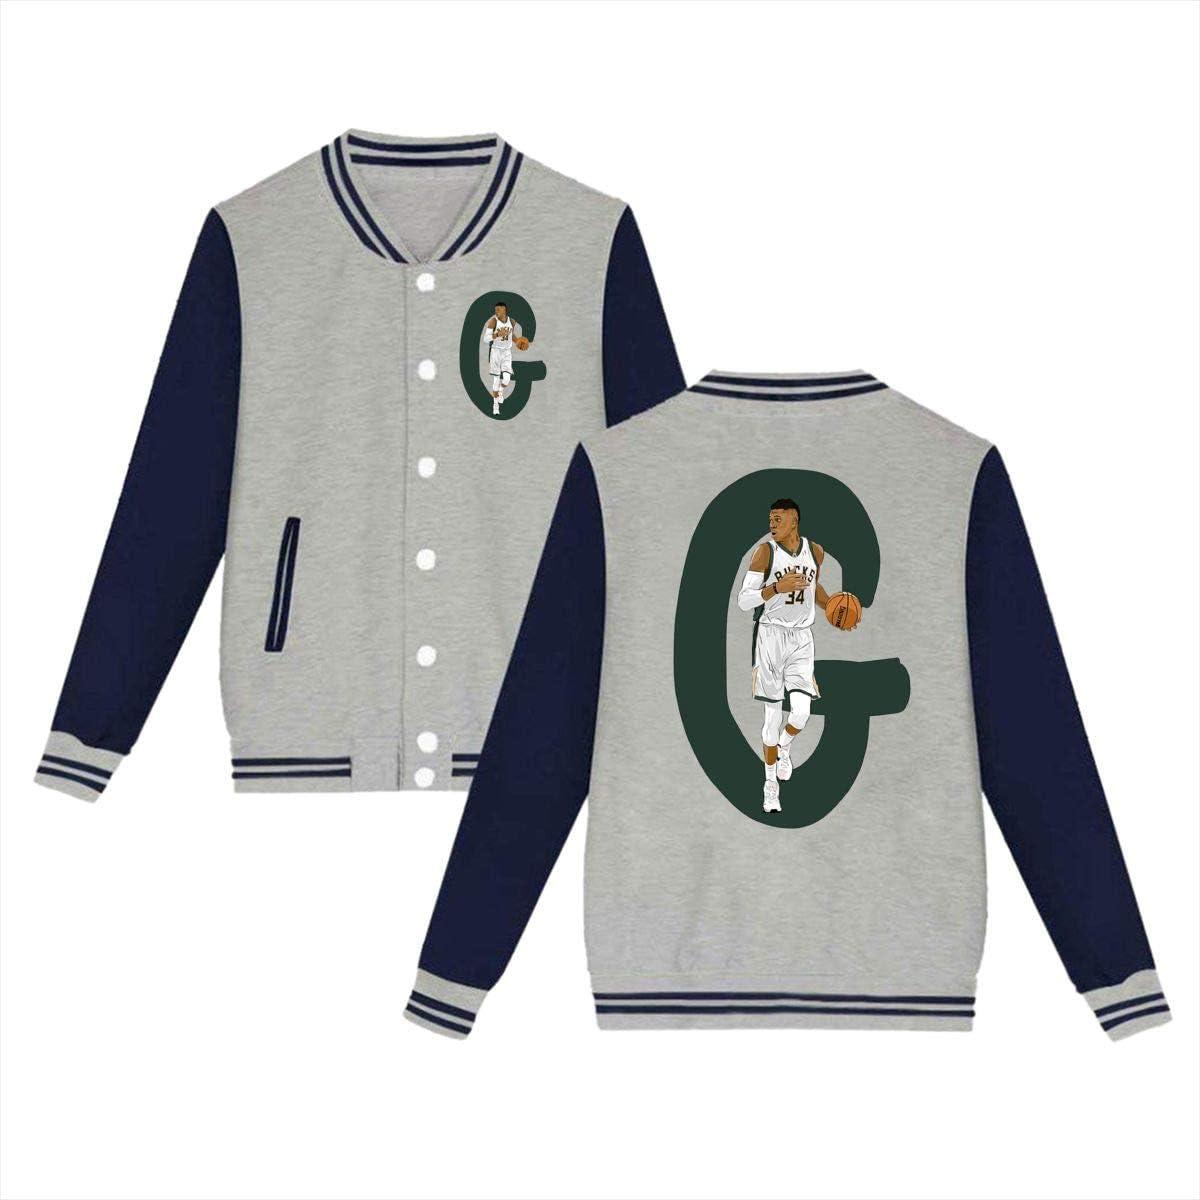 Celinion Giannis 34# Antetokounmpo Unisex Baseball Uniform Jacket Sport Coat for Womens Mens Youth